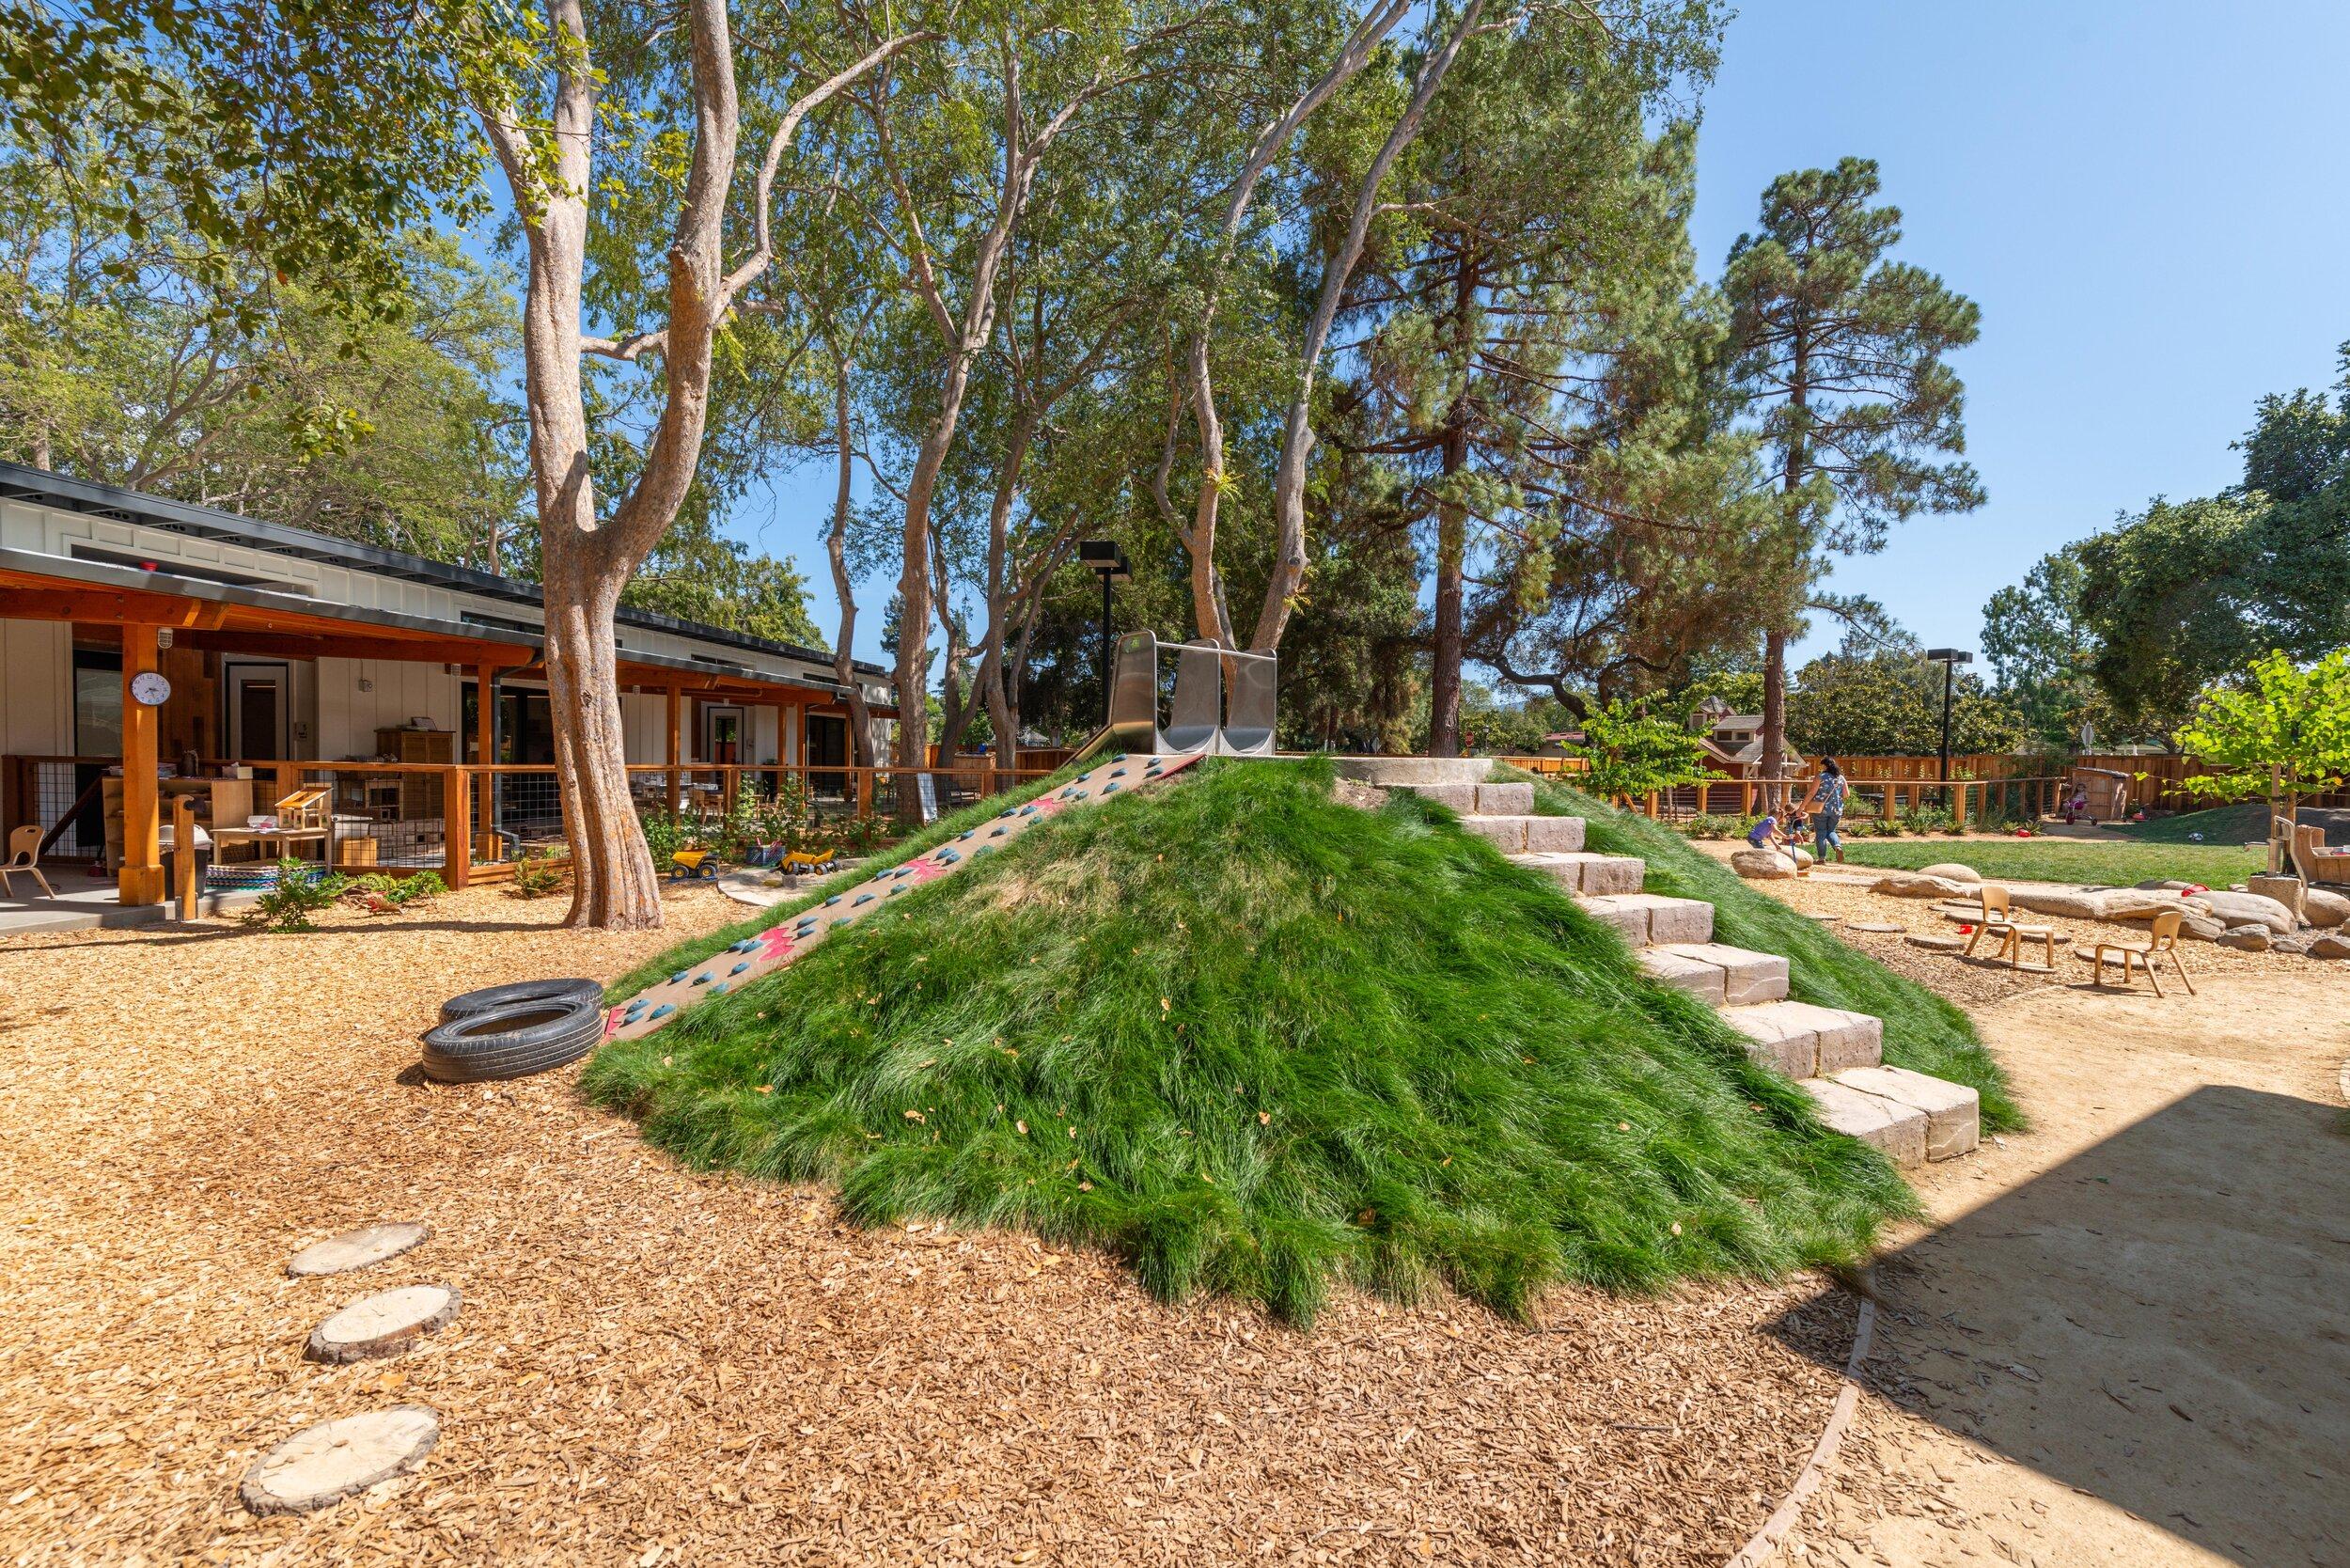 Childrens_Center_of_Stanford_Community_Preschool-3_lo.jpg